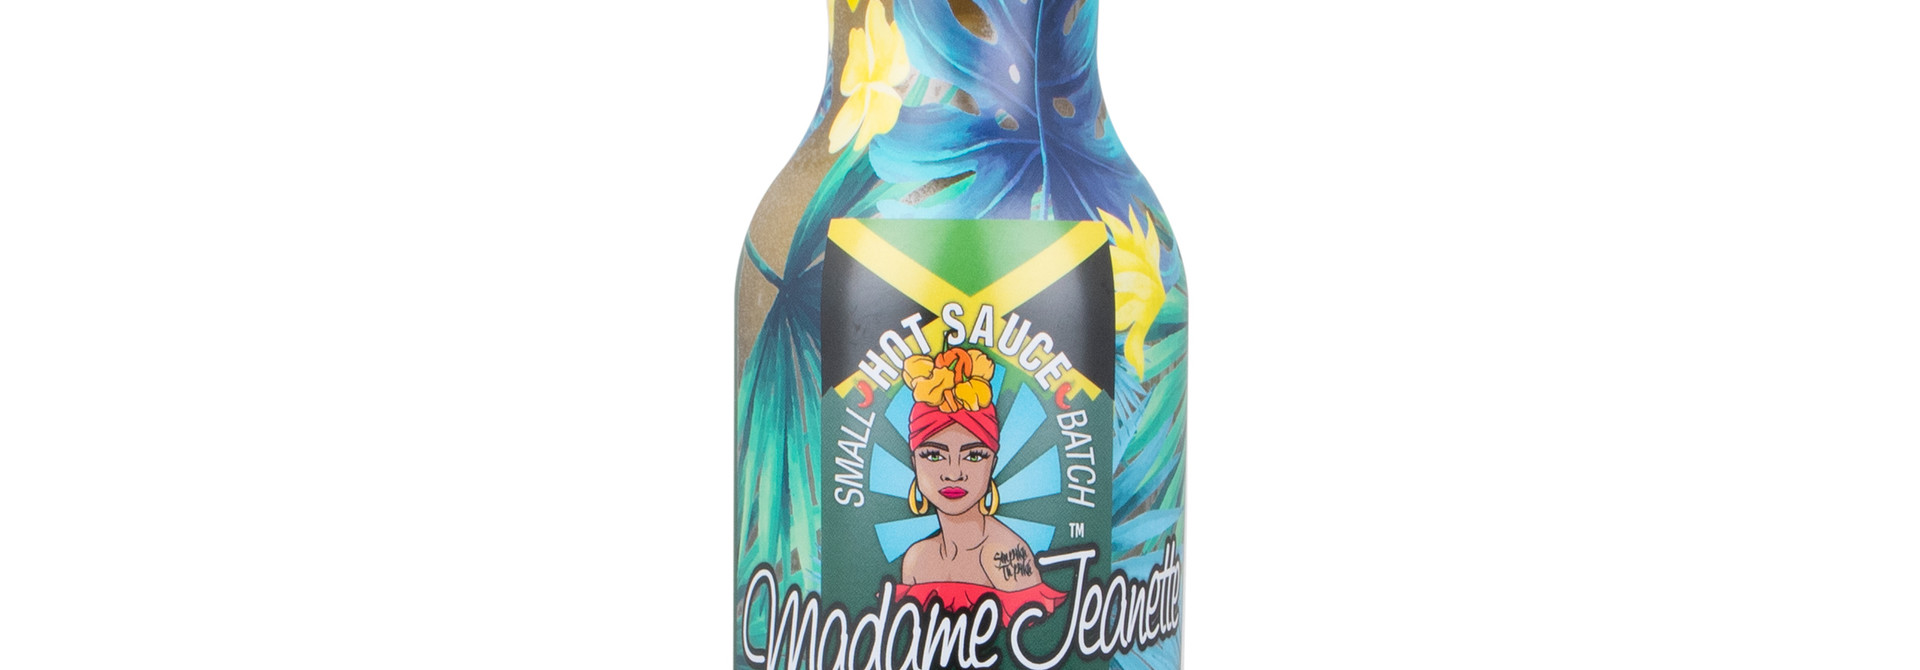 Madame Jeanette Hot Sauce™️ - Jamaican Jive 200ml Glass Bottle